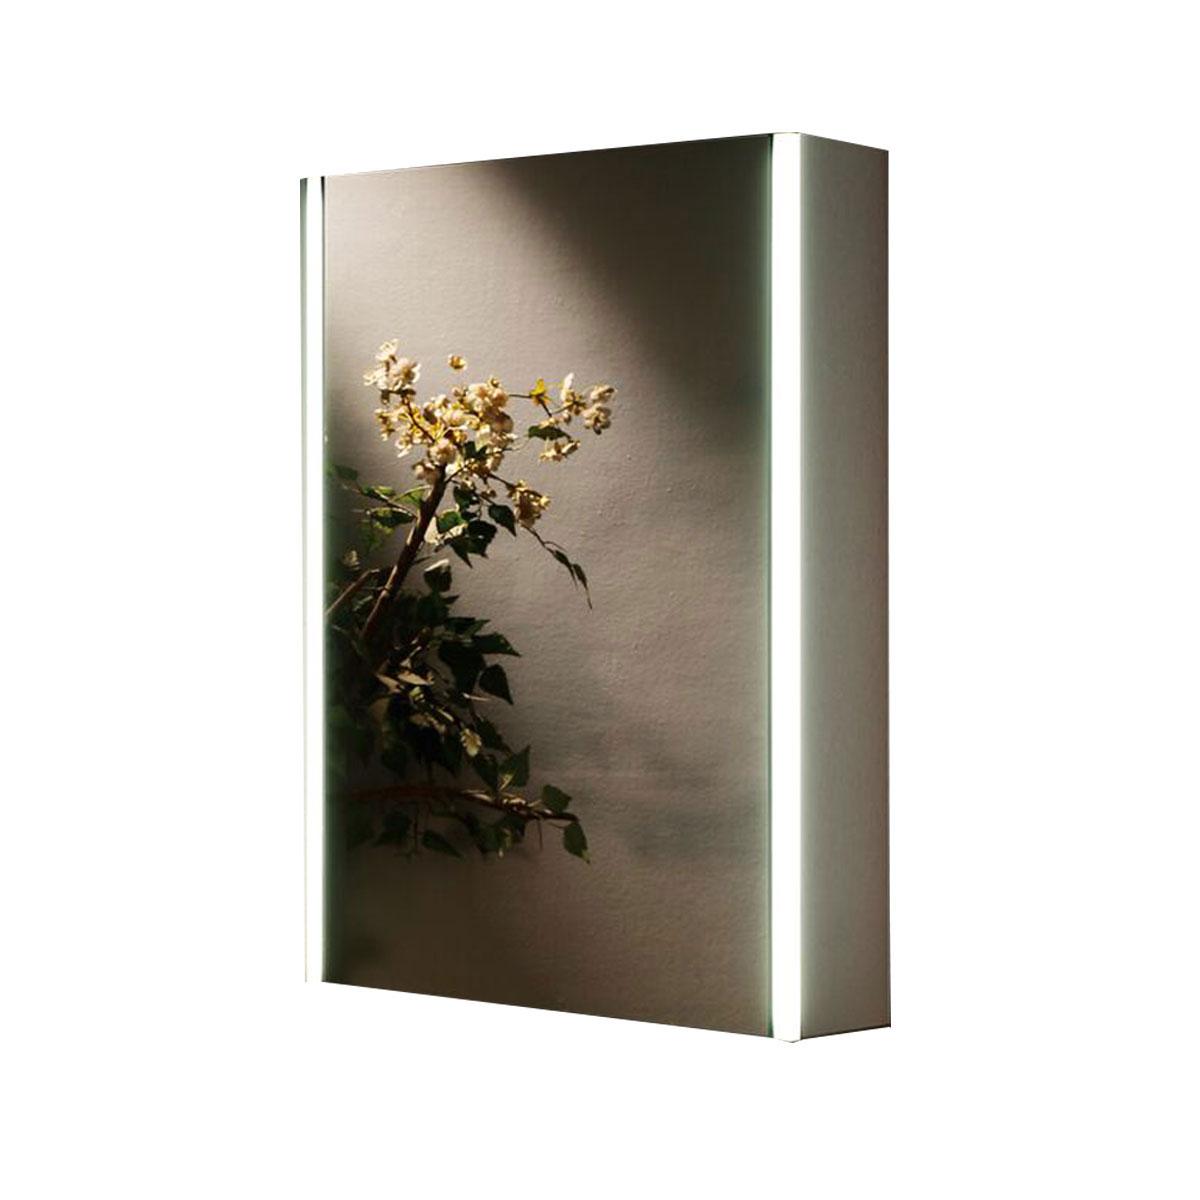 Emerald led backlit mirrored bathroom cabinet bluetooth for Bathroom cabinets 50cm wide